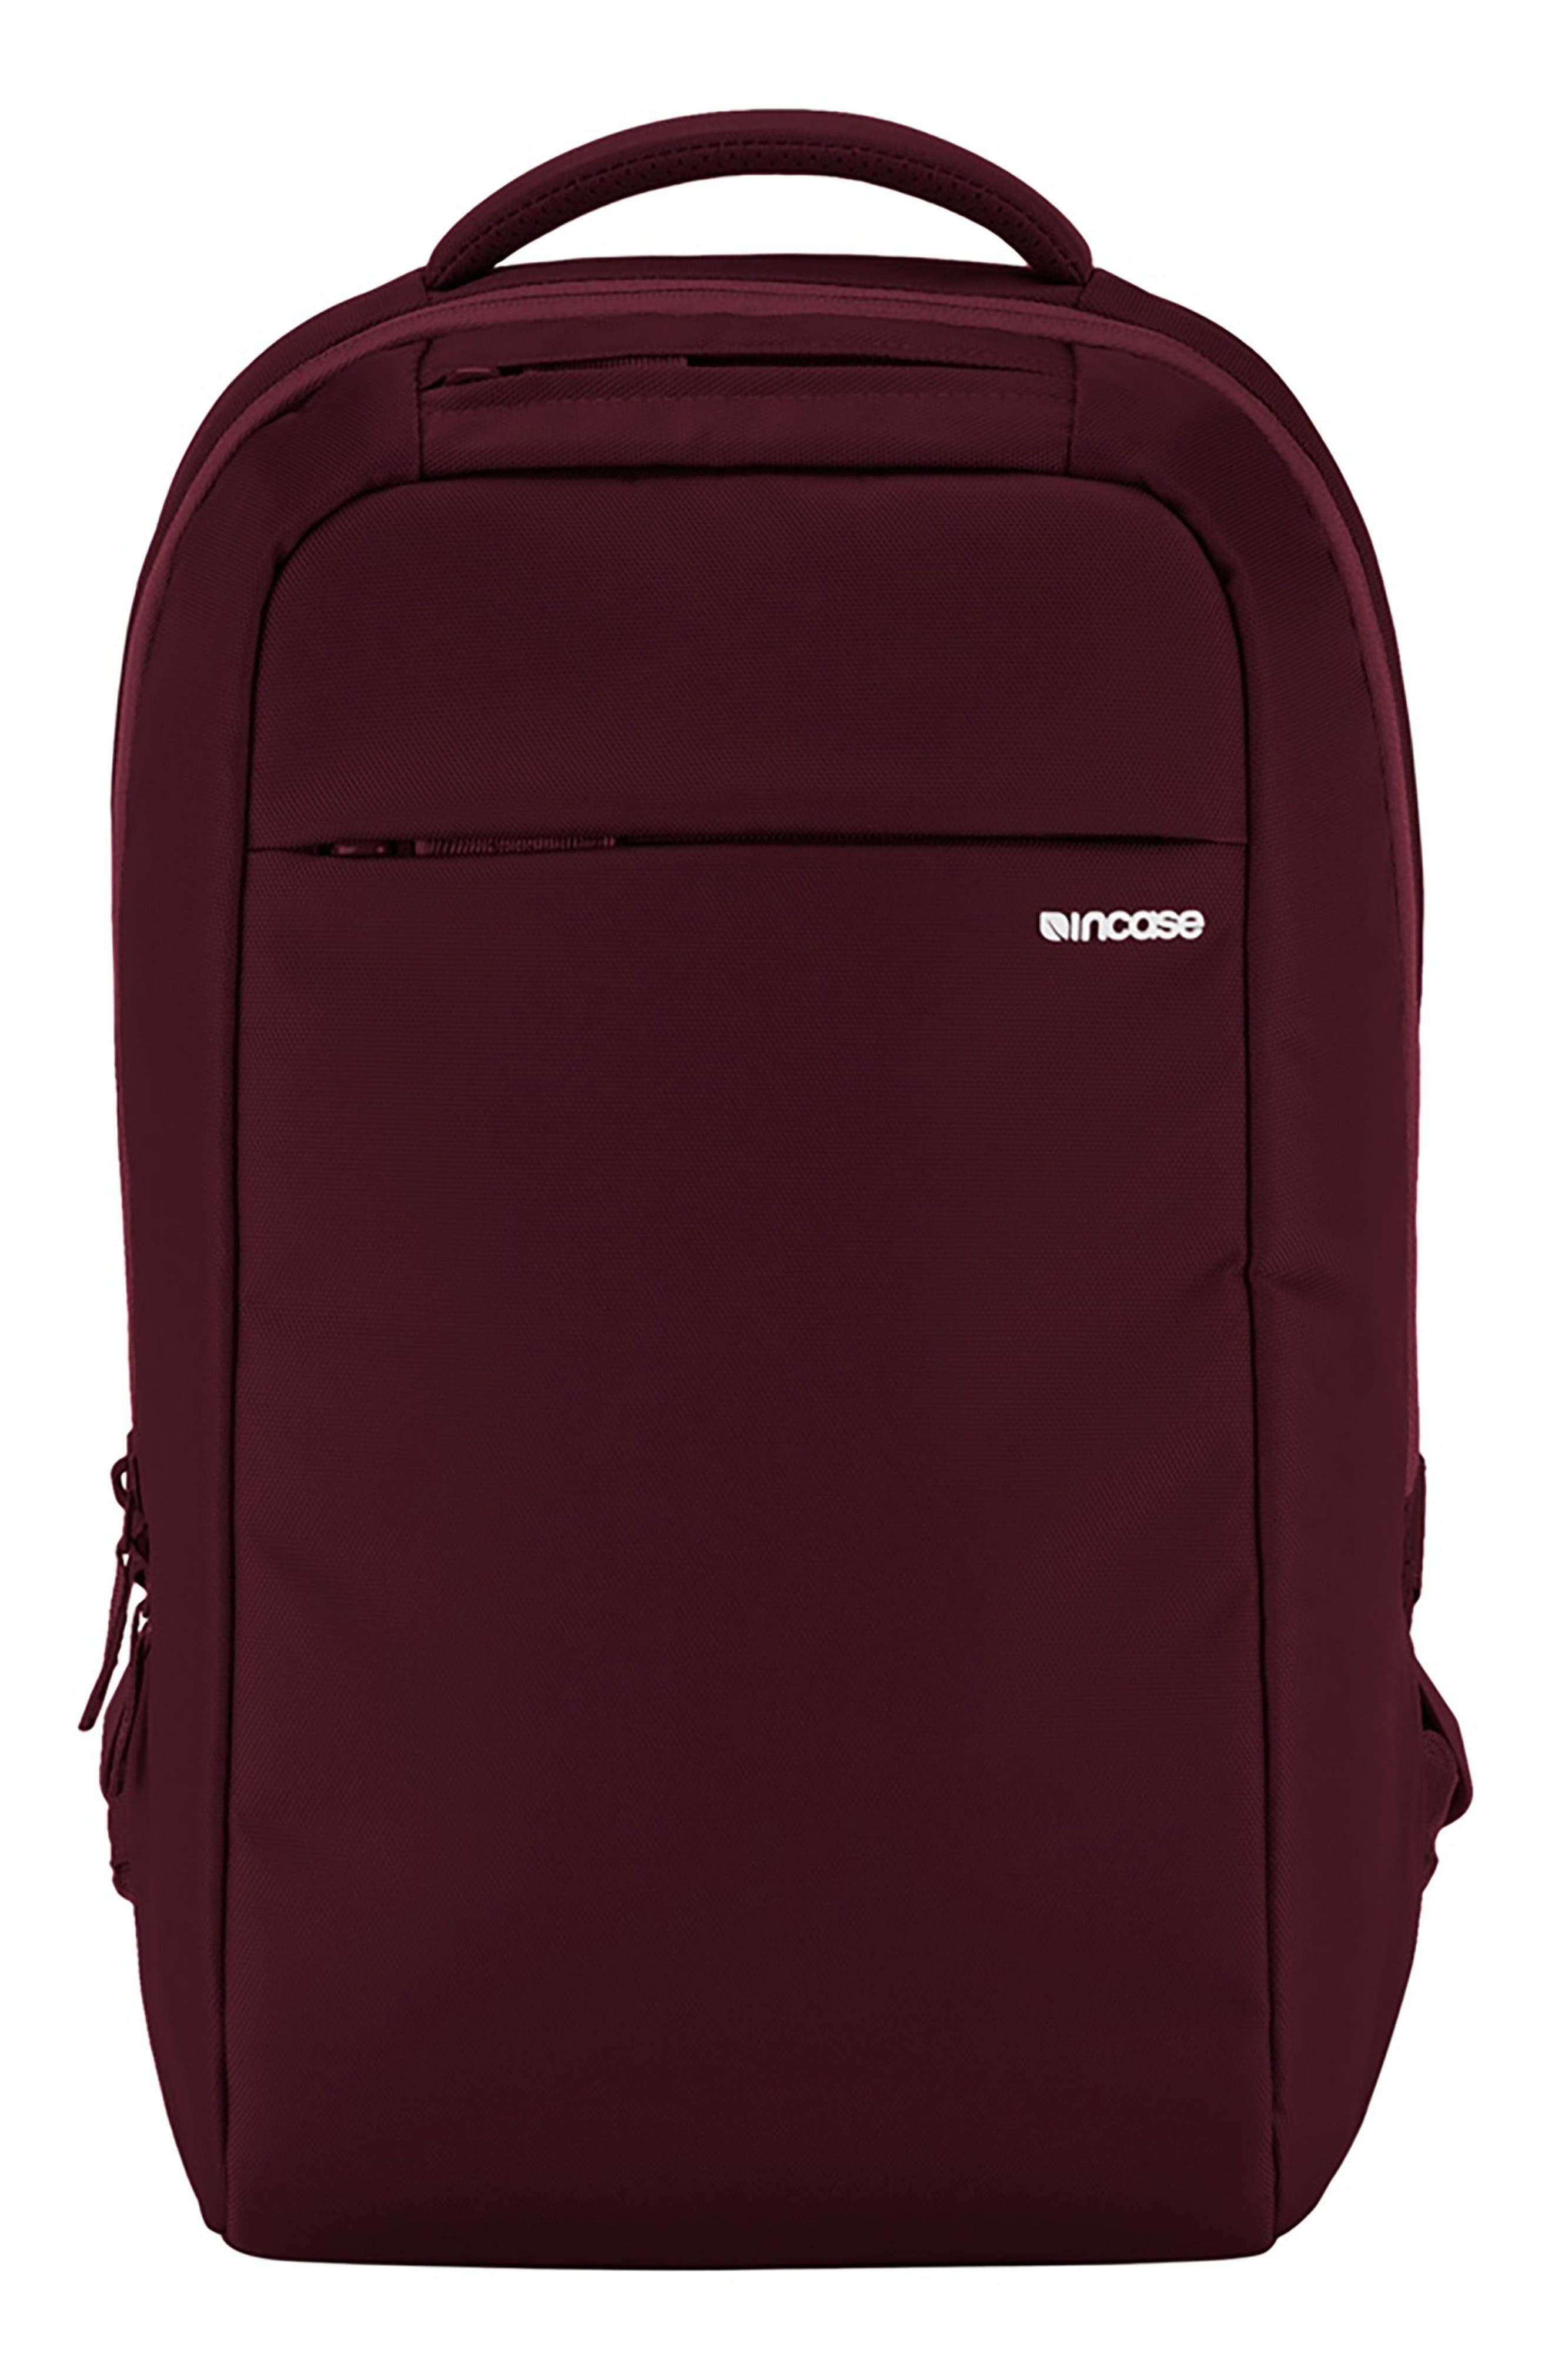 Incase Designs Icon Lite Backpack